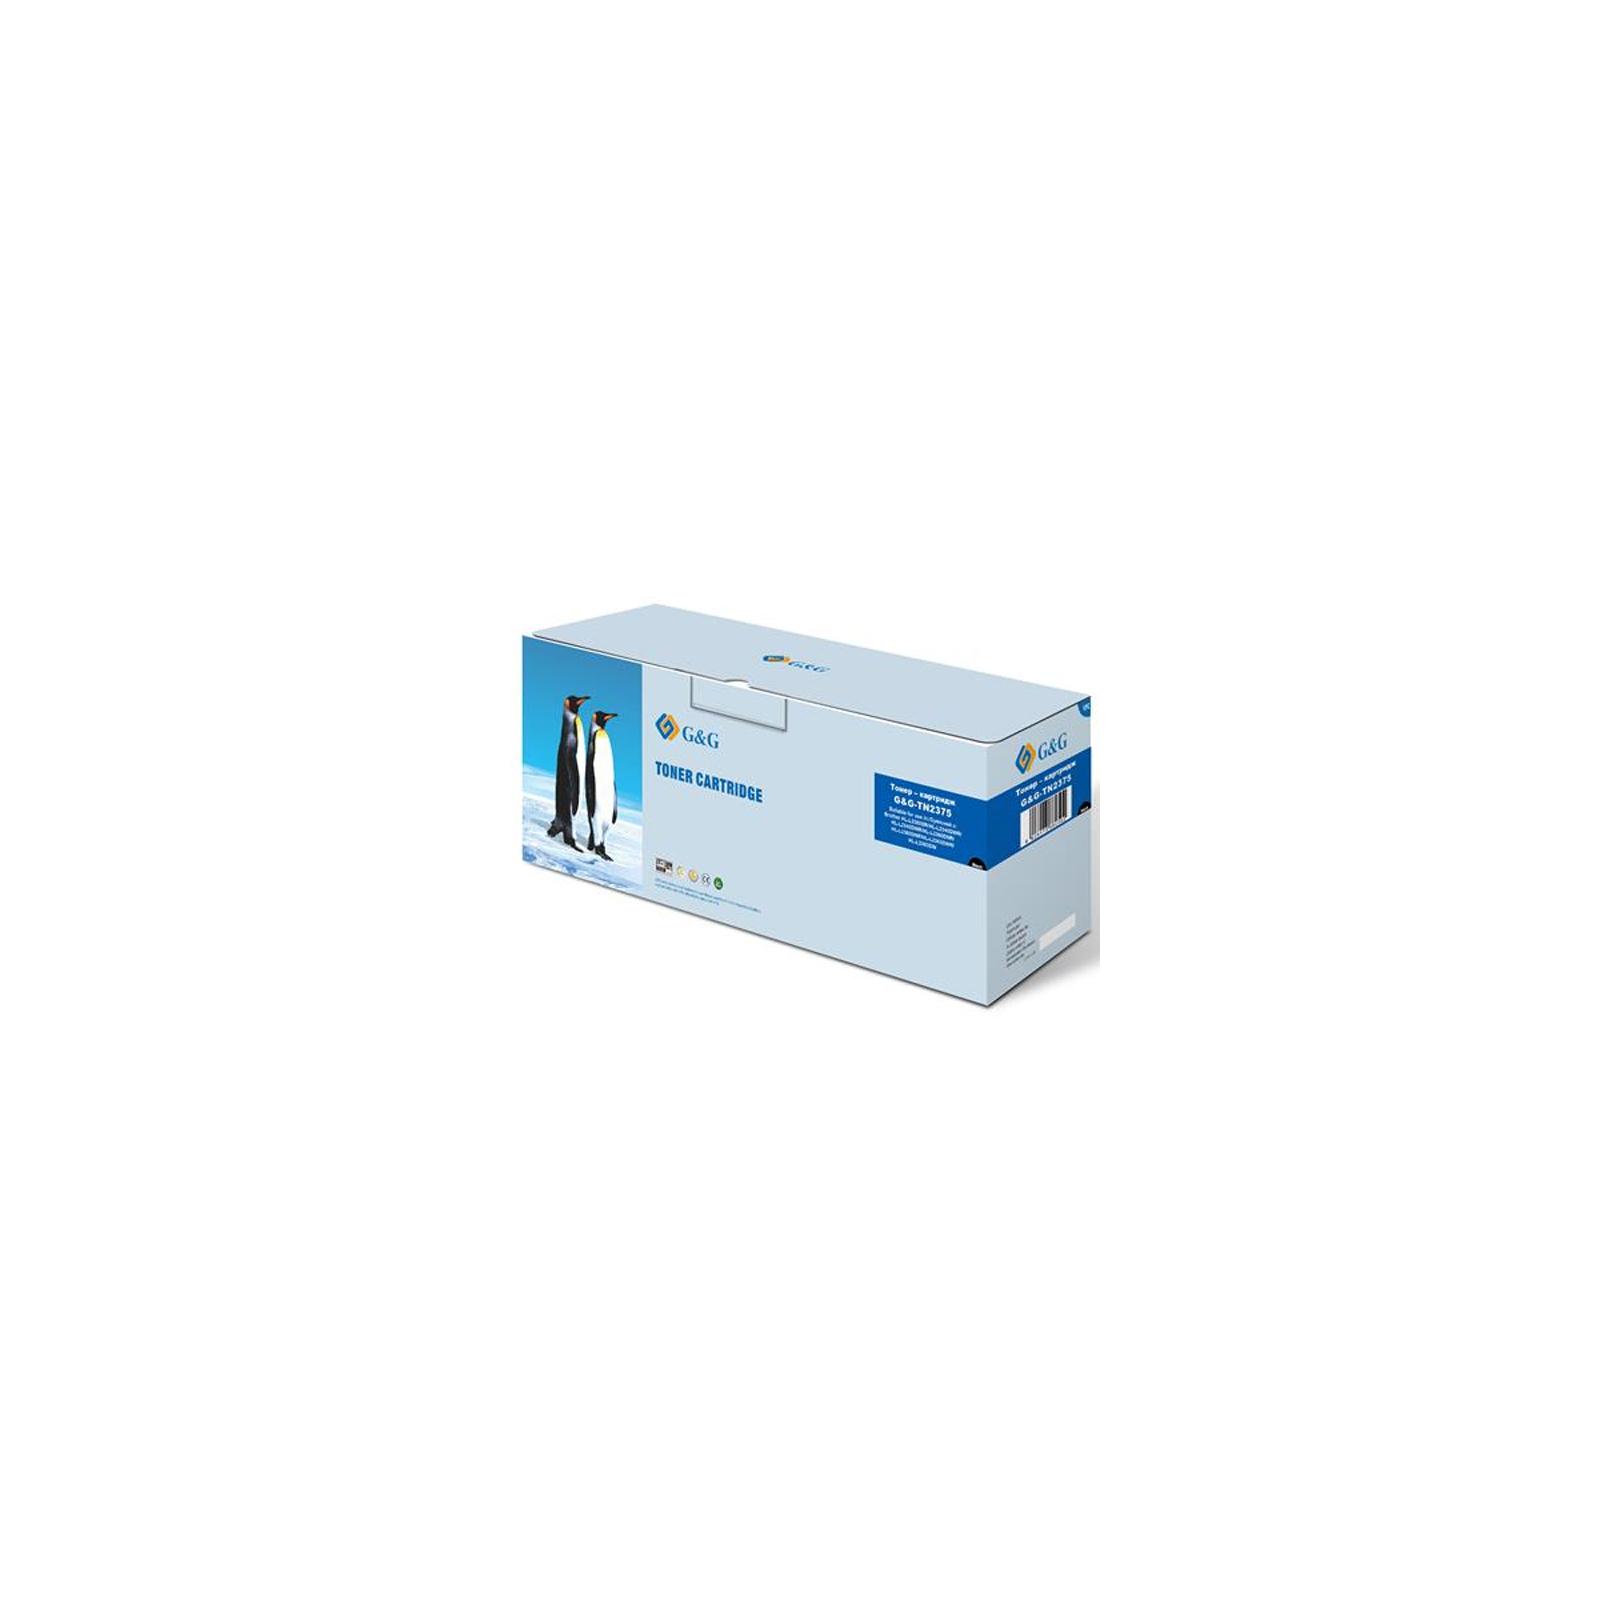 Картридж G&G для Brother HL-L2360/2365/DCP-L2500 max Black (G&G-TN2375)